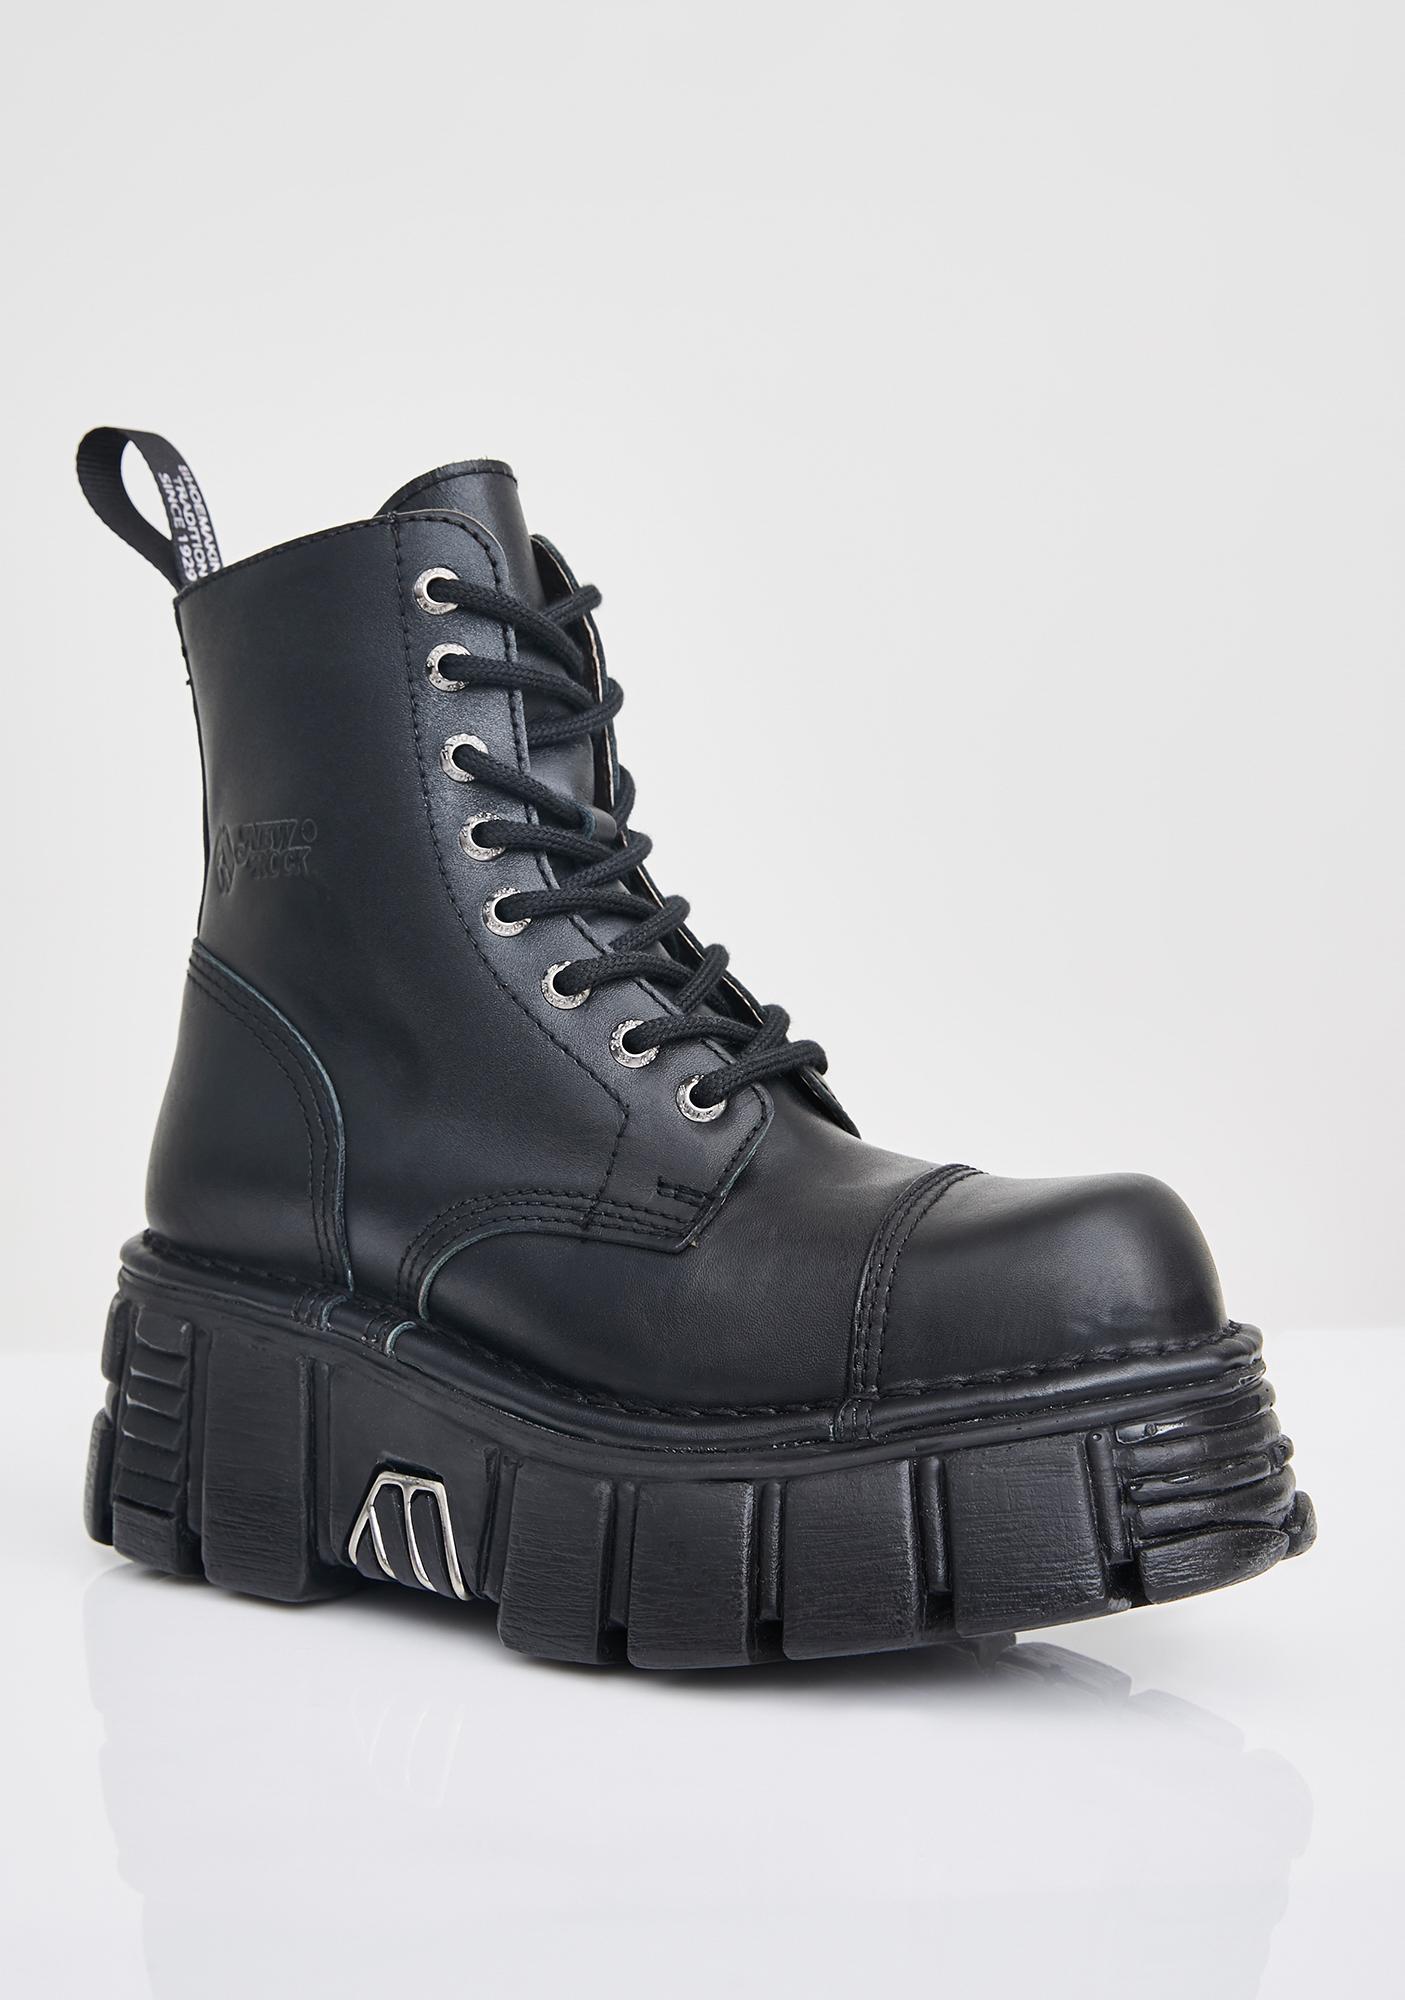 New Rock Knife Combat Boots